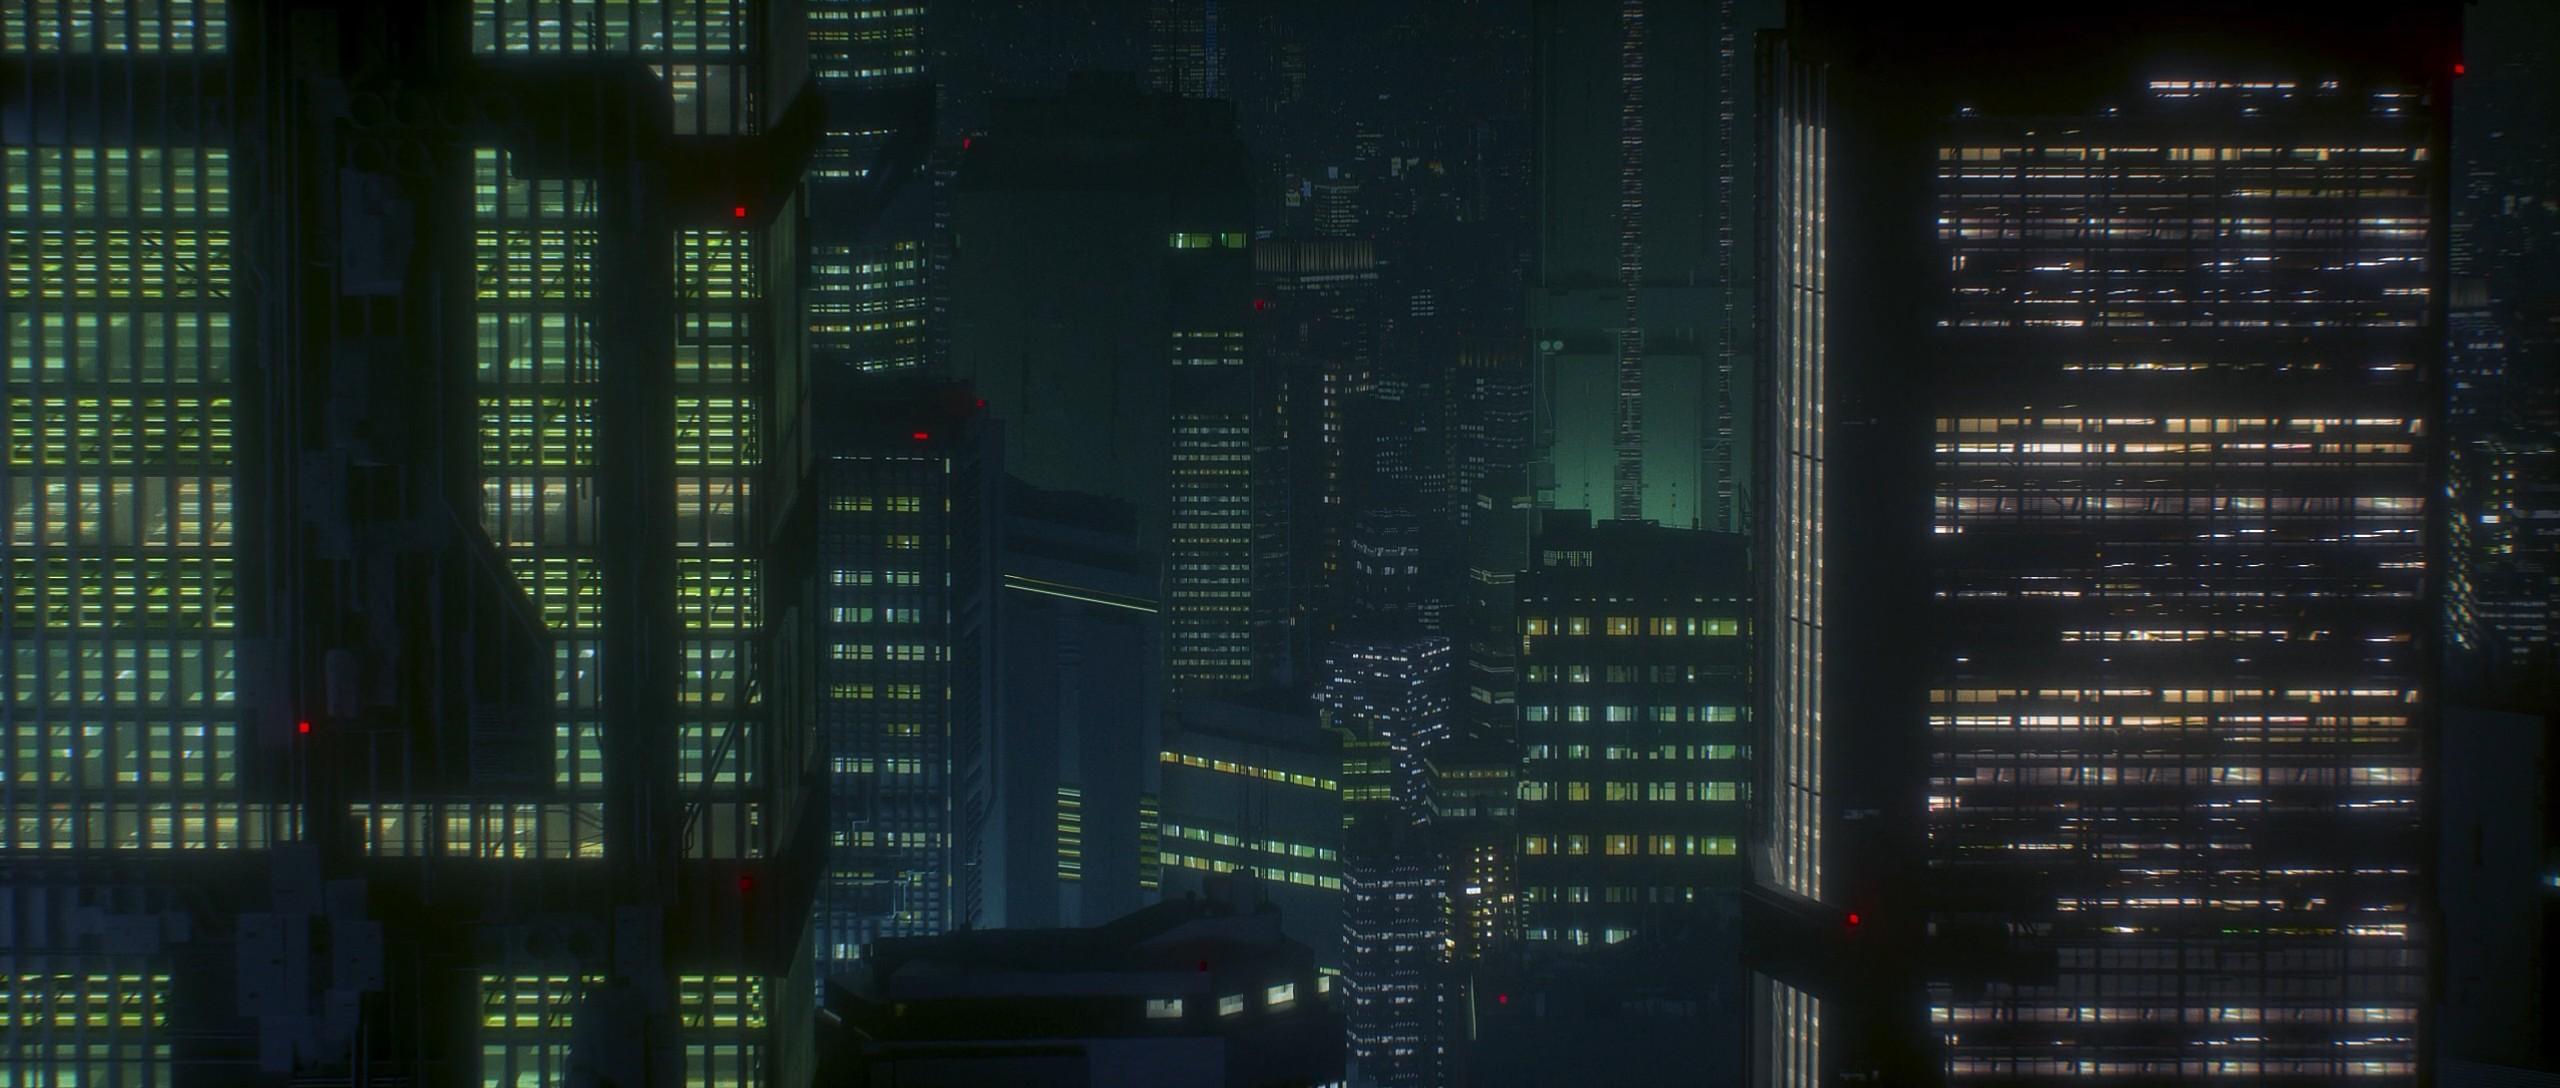 Wallpaper Akira Awaken Akira Anime Cyberpunk Building